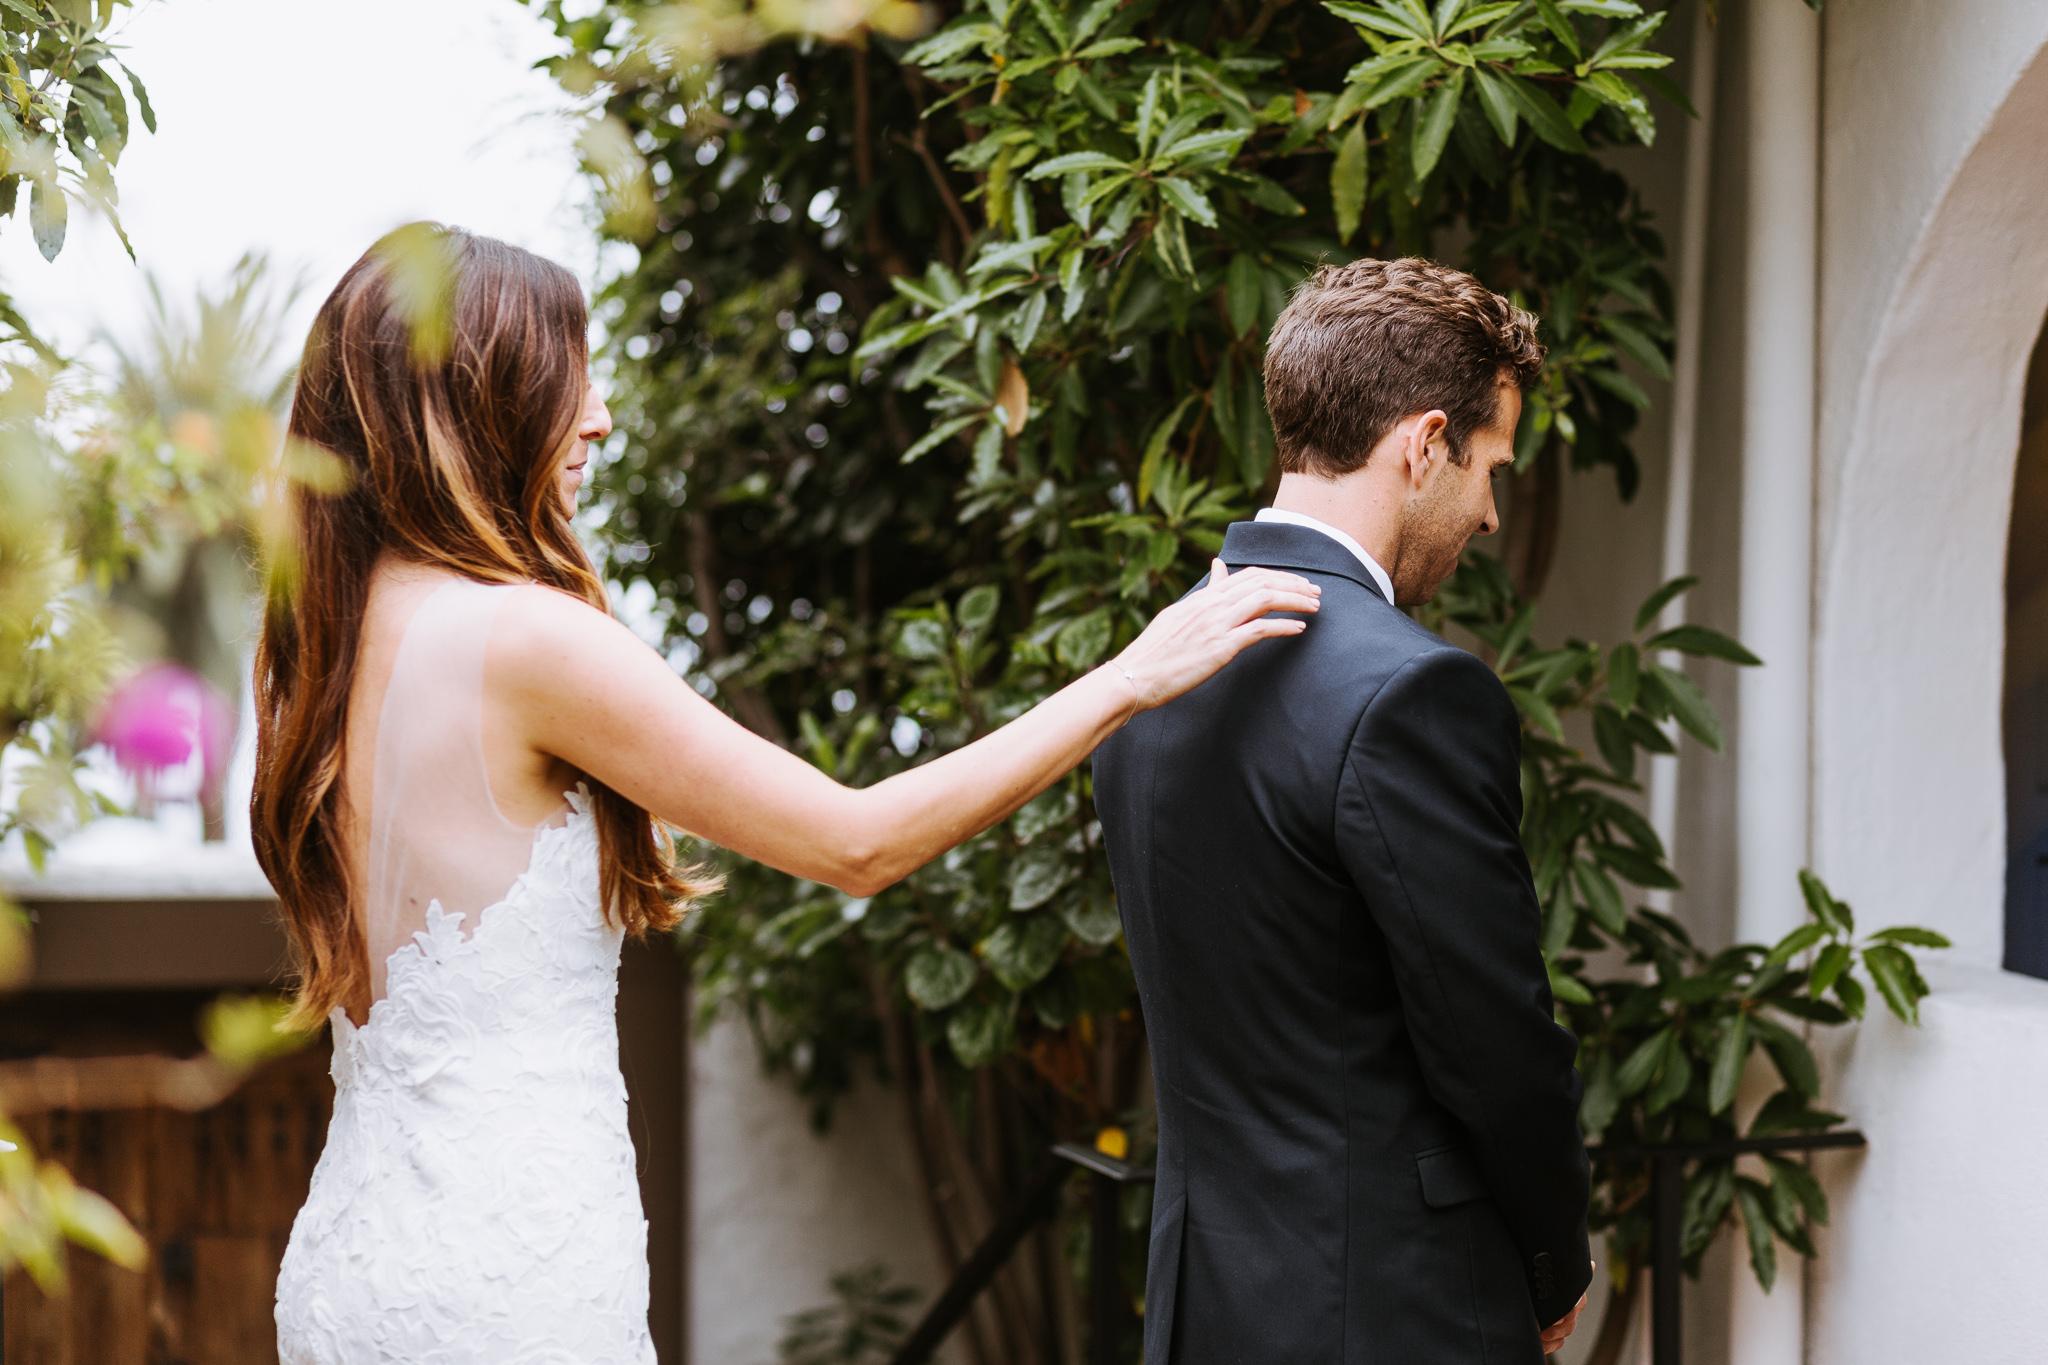 LagunaBeach-WeddingPhotographer-16.jpg